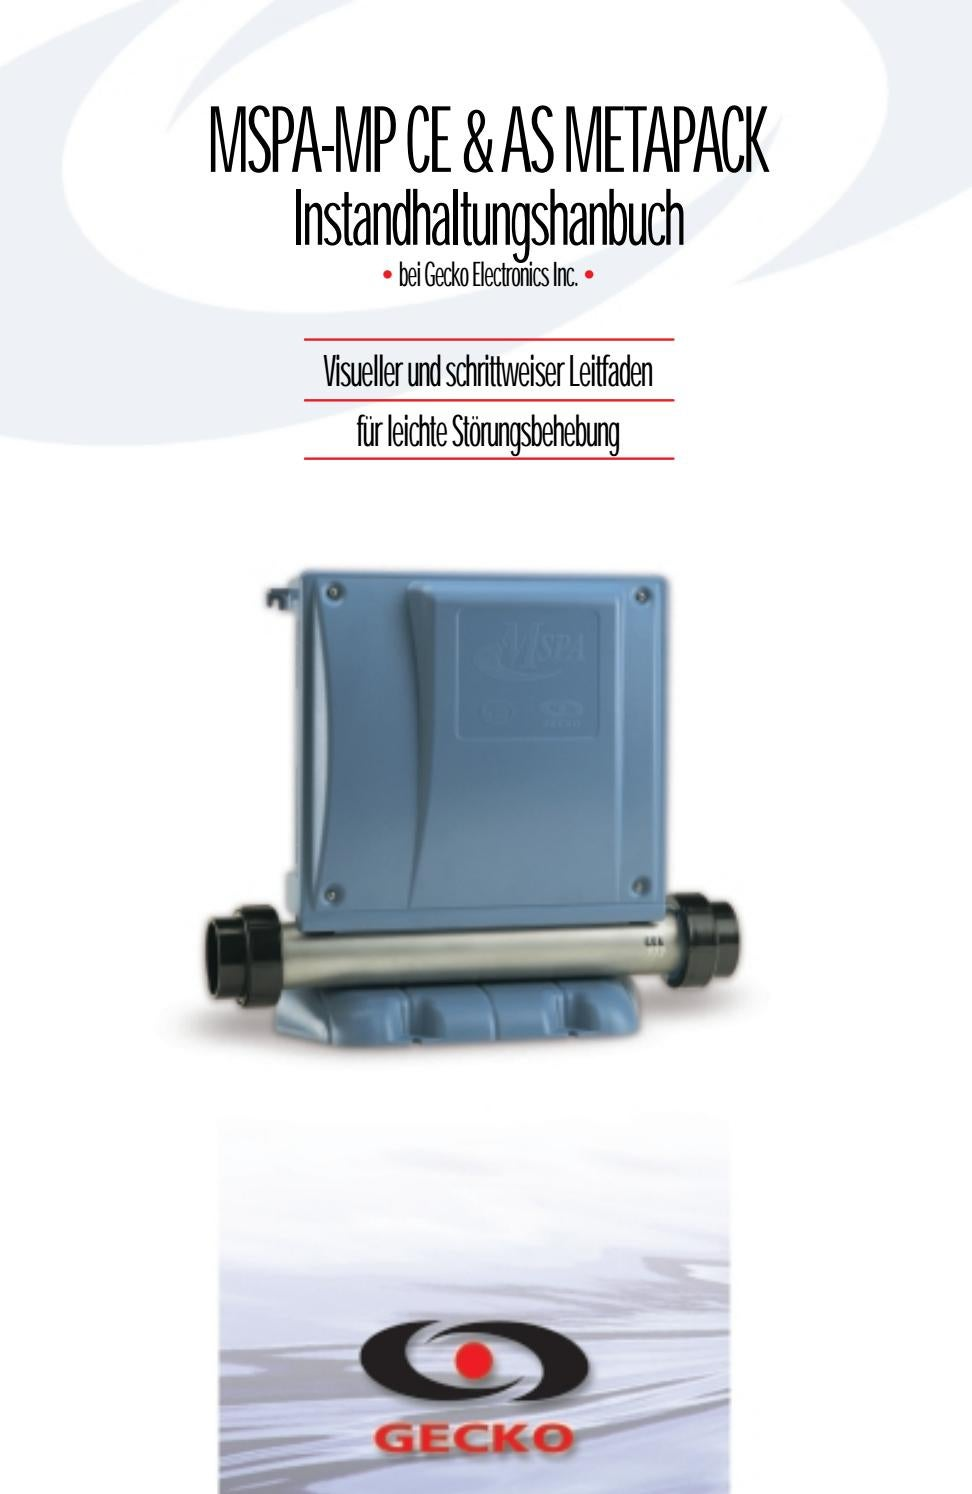 M-Class MC-MP-CE control system service manual (Deutsch) by Gecko ...